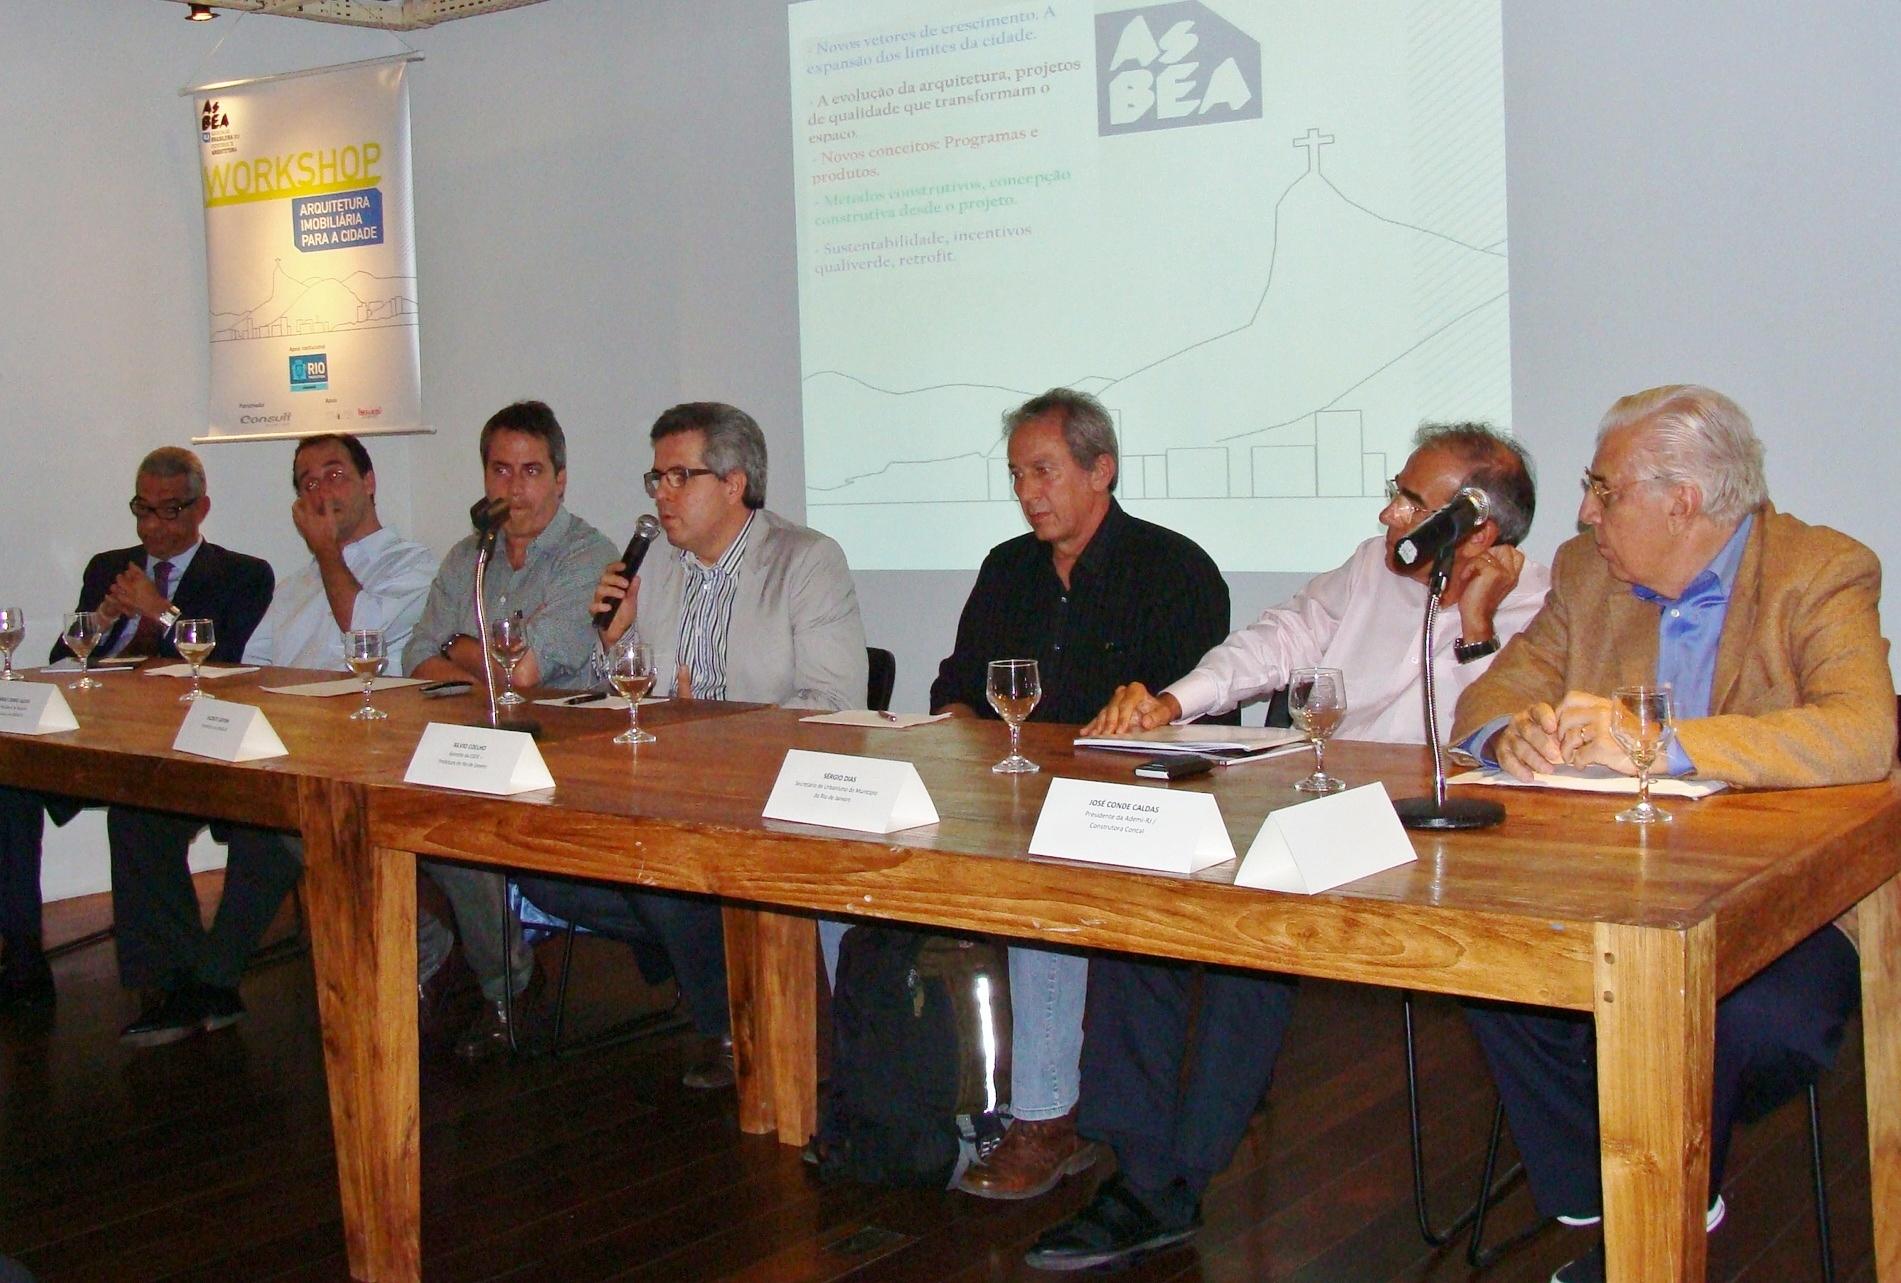 Workshop da ASBEA/RJ